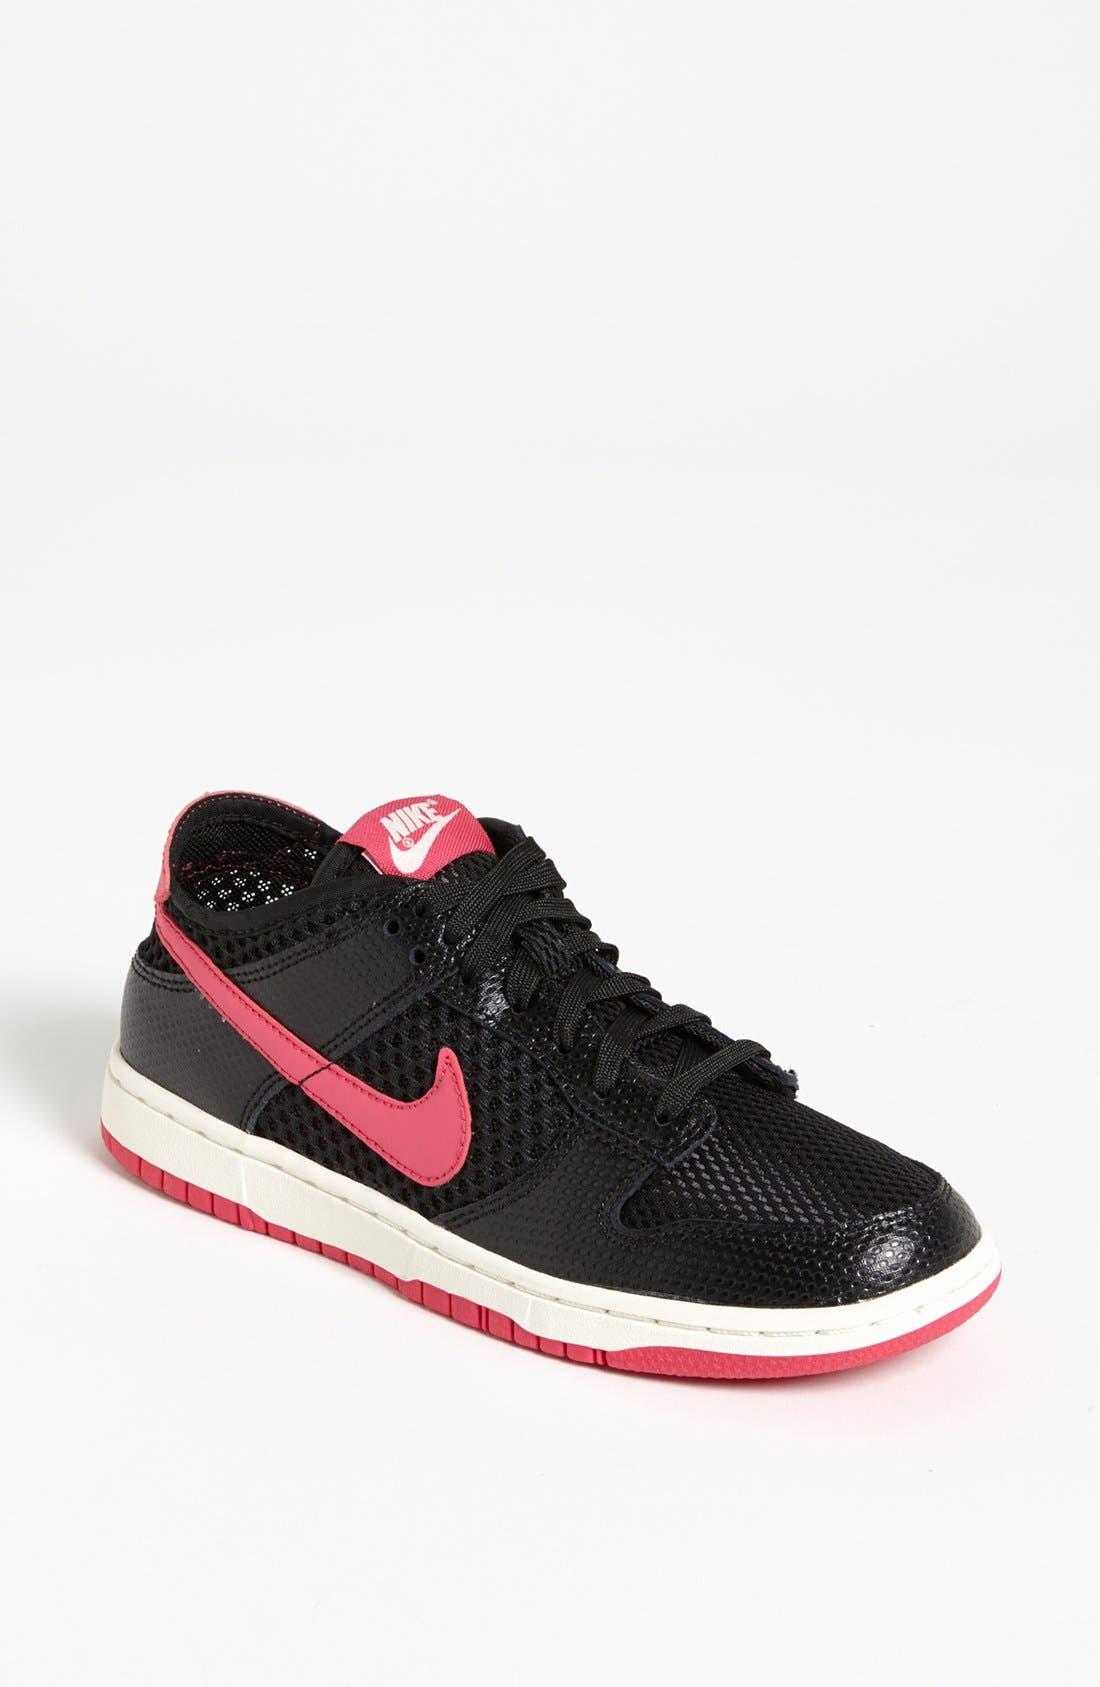 Alternate Image 1 Selected - Nike 'Dunk Low' Sneaker (Women)